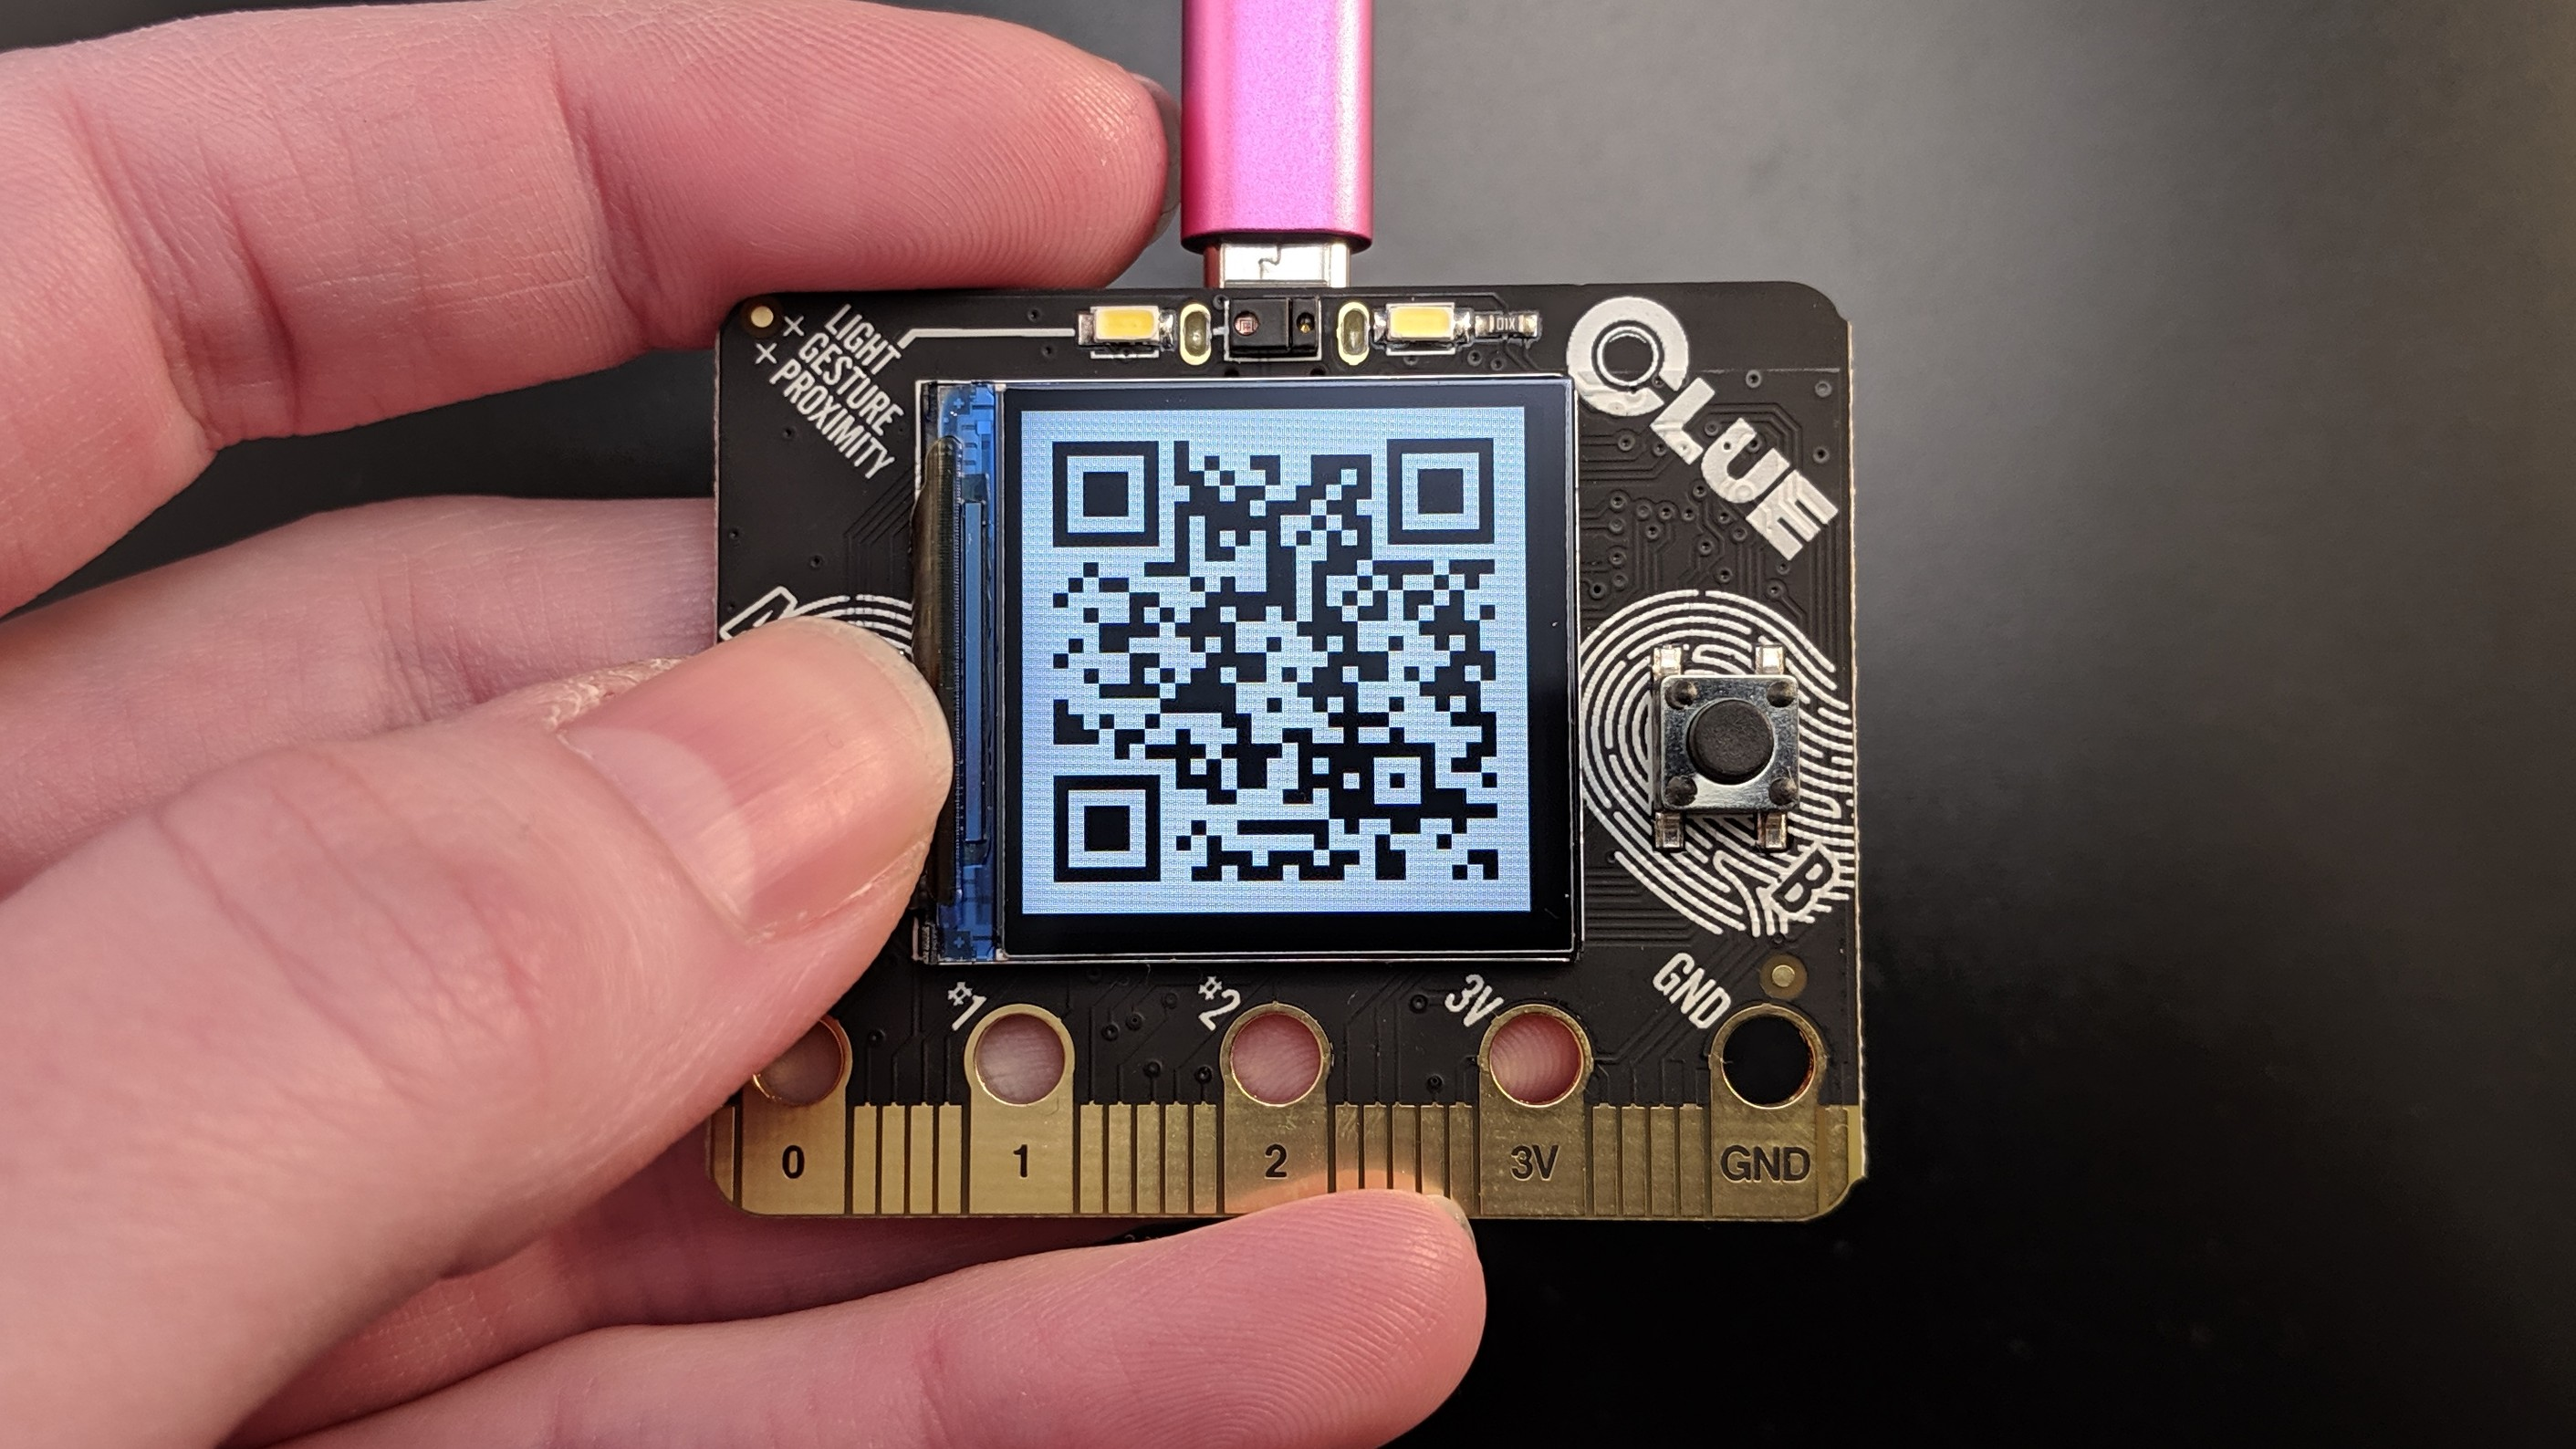 adafruit_products_CLUE_PyBadger_custom_badge_qr_code.jpg